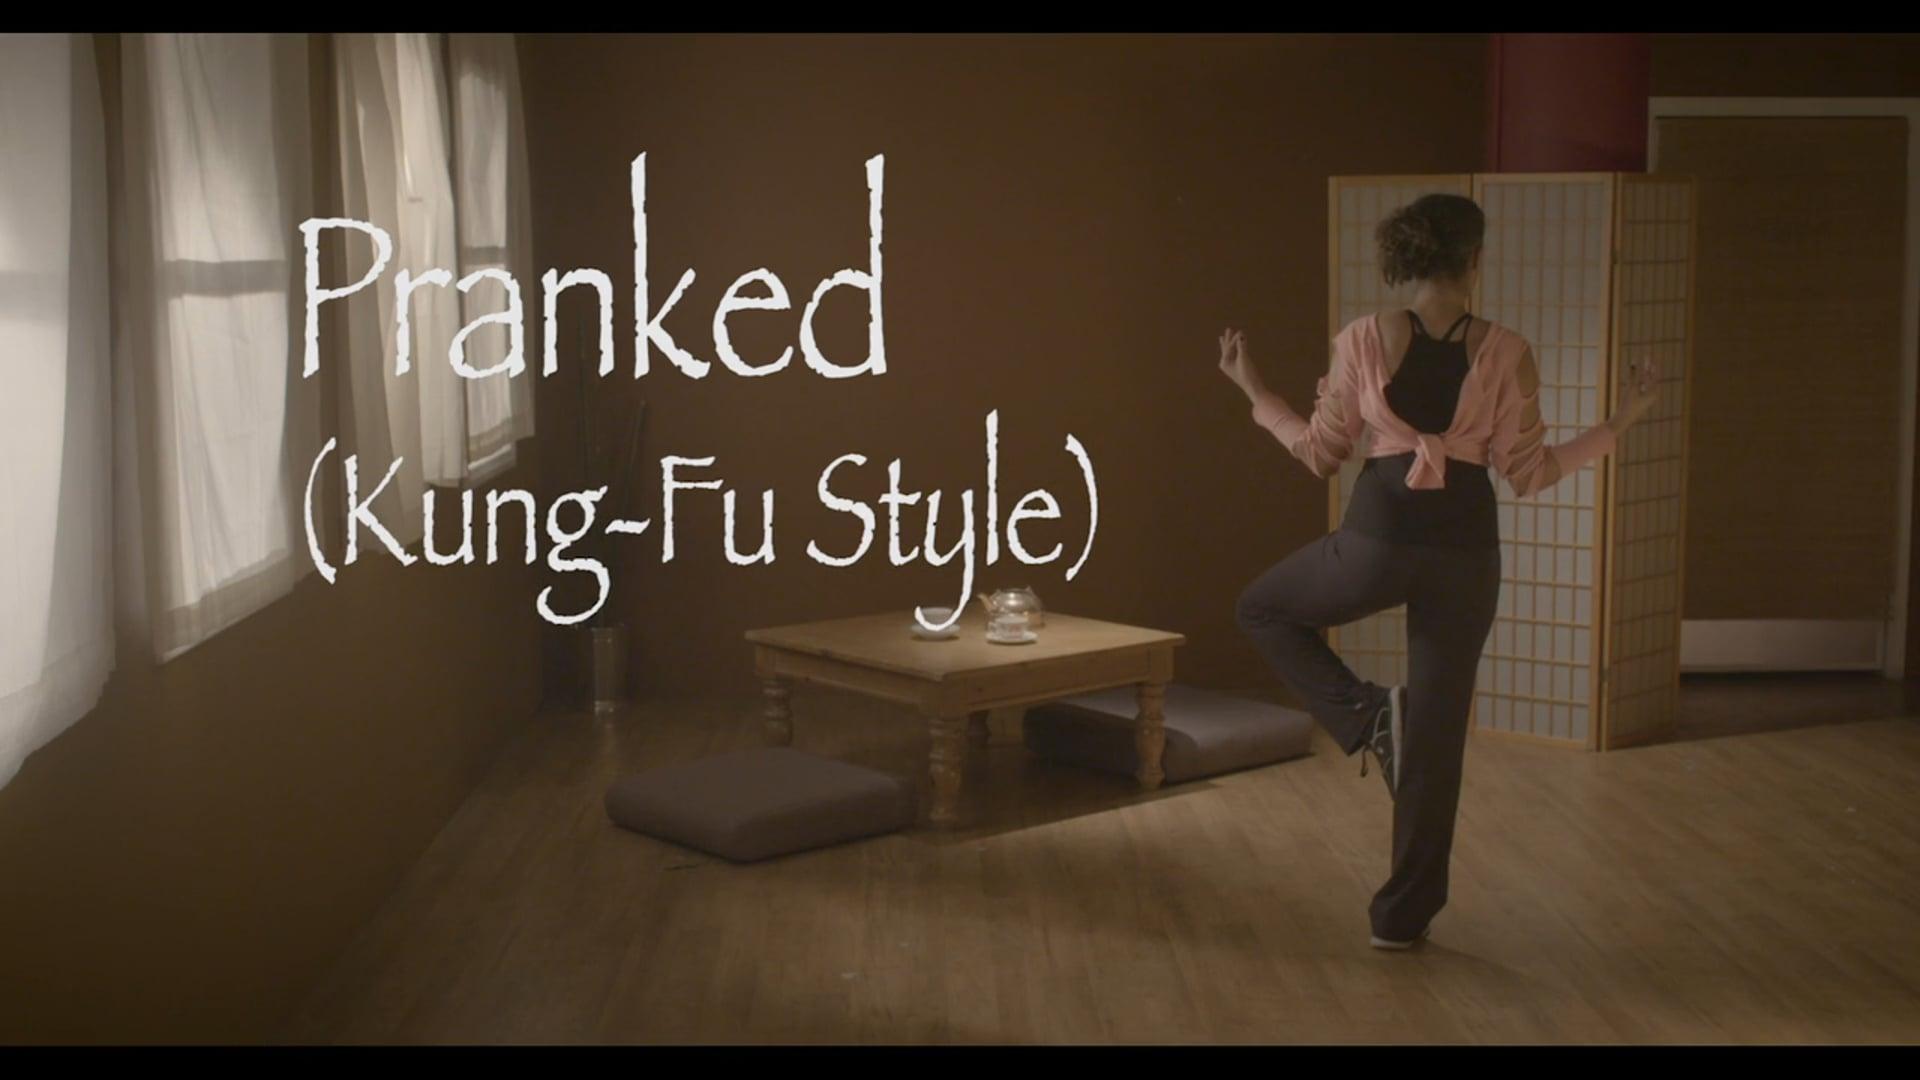 Pranked (kung-fu style)